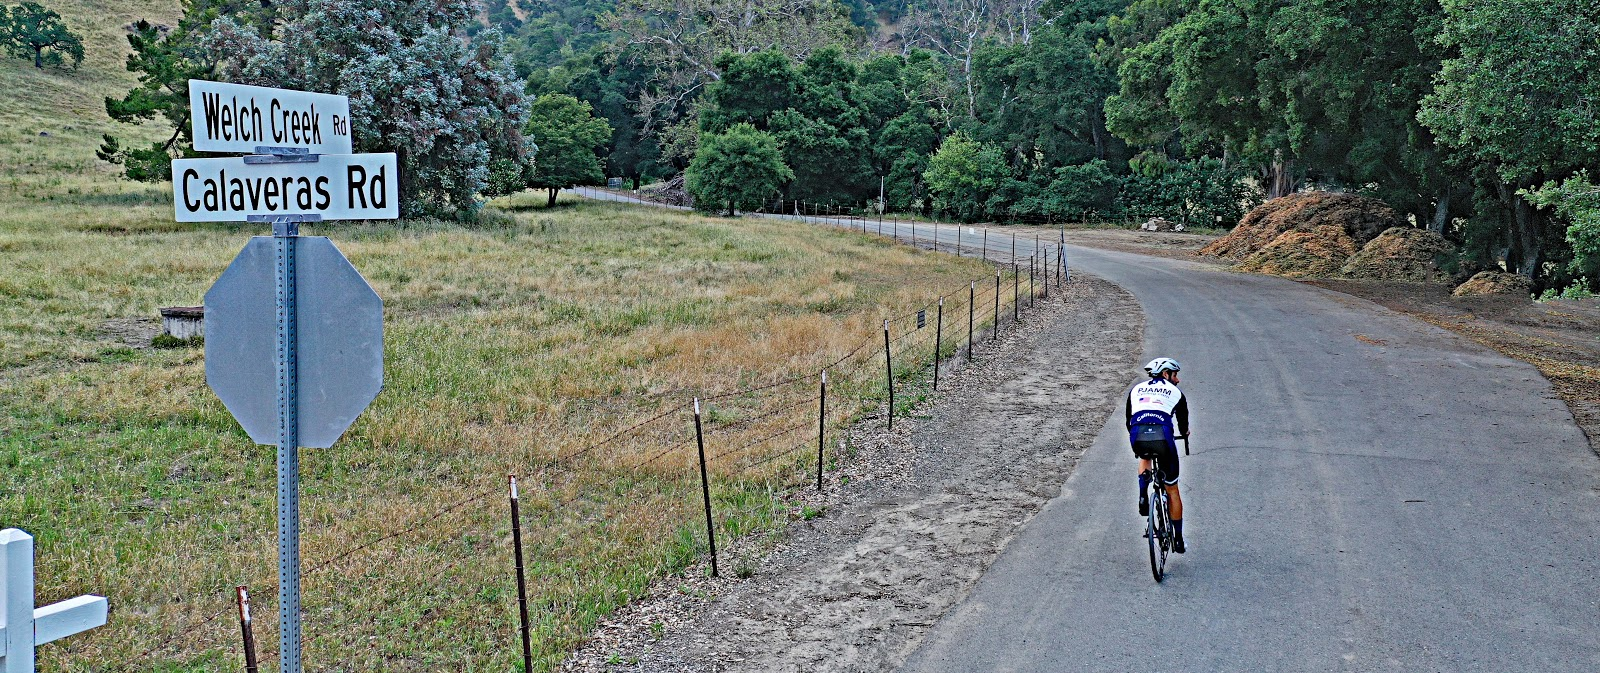 Bike climb Welch Creek Road - one lane road sign, roadway and oak trees